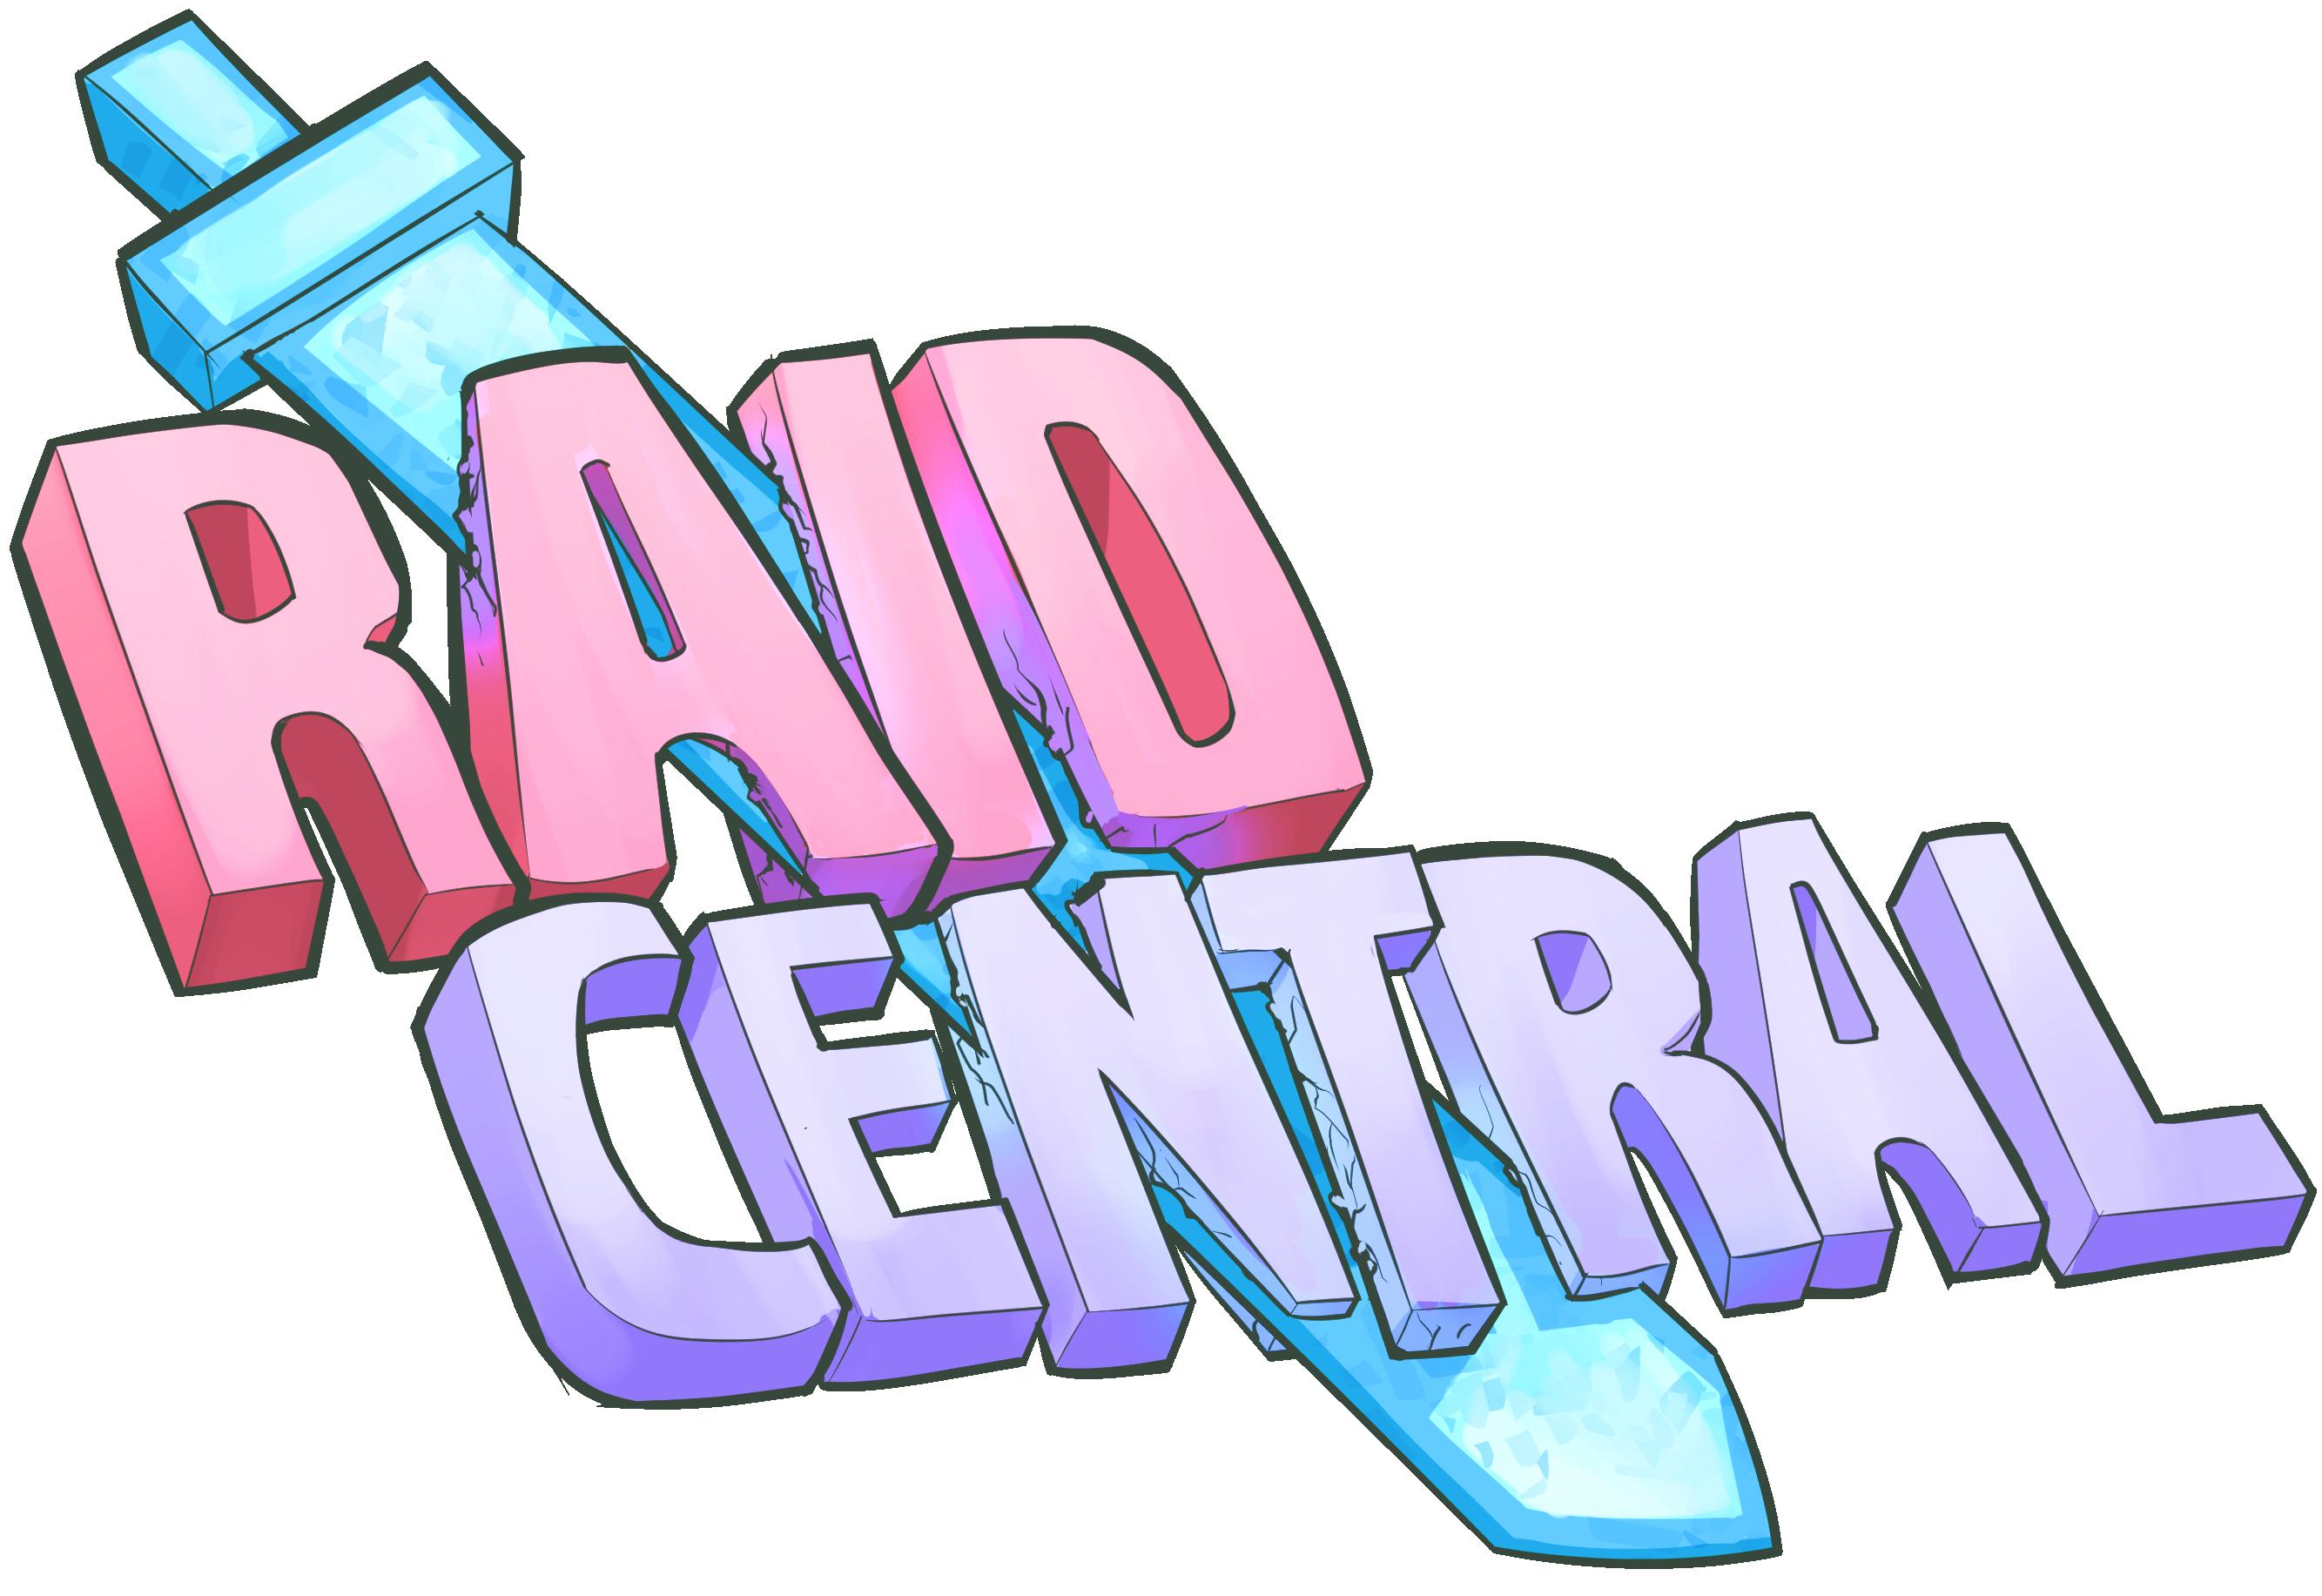 RaidCentral